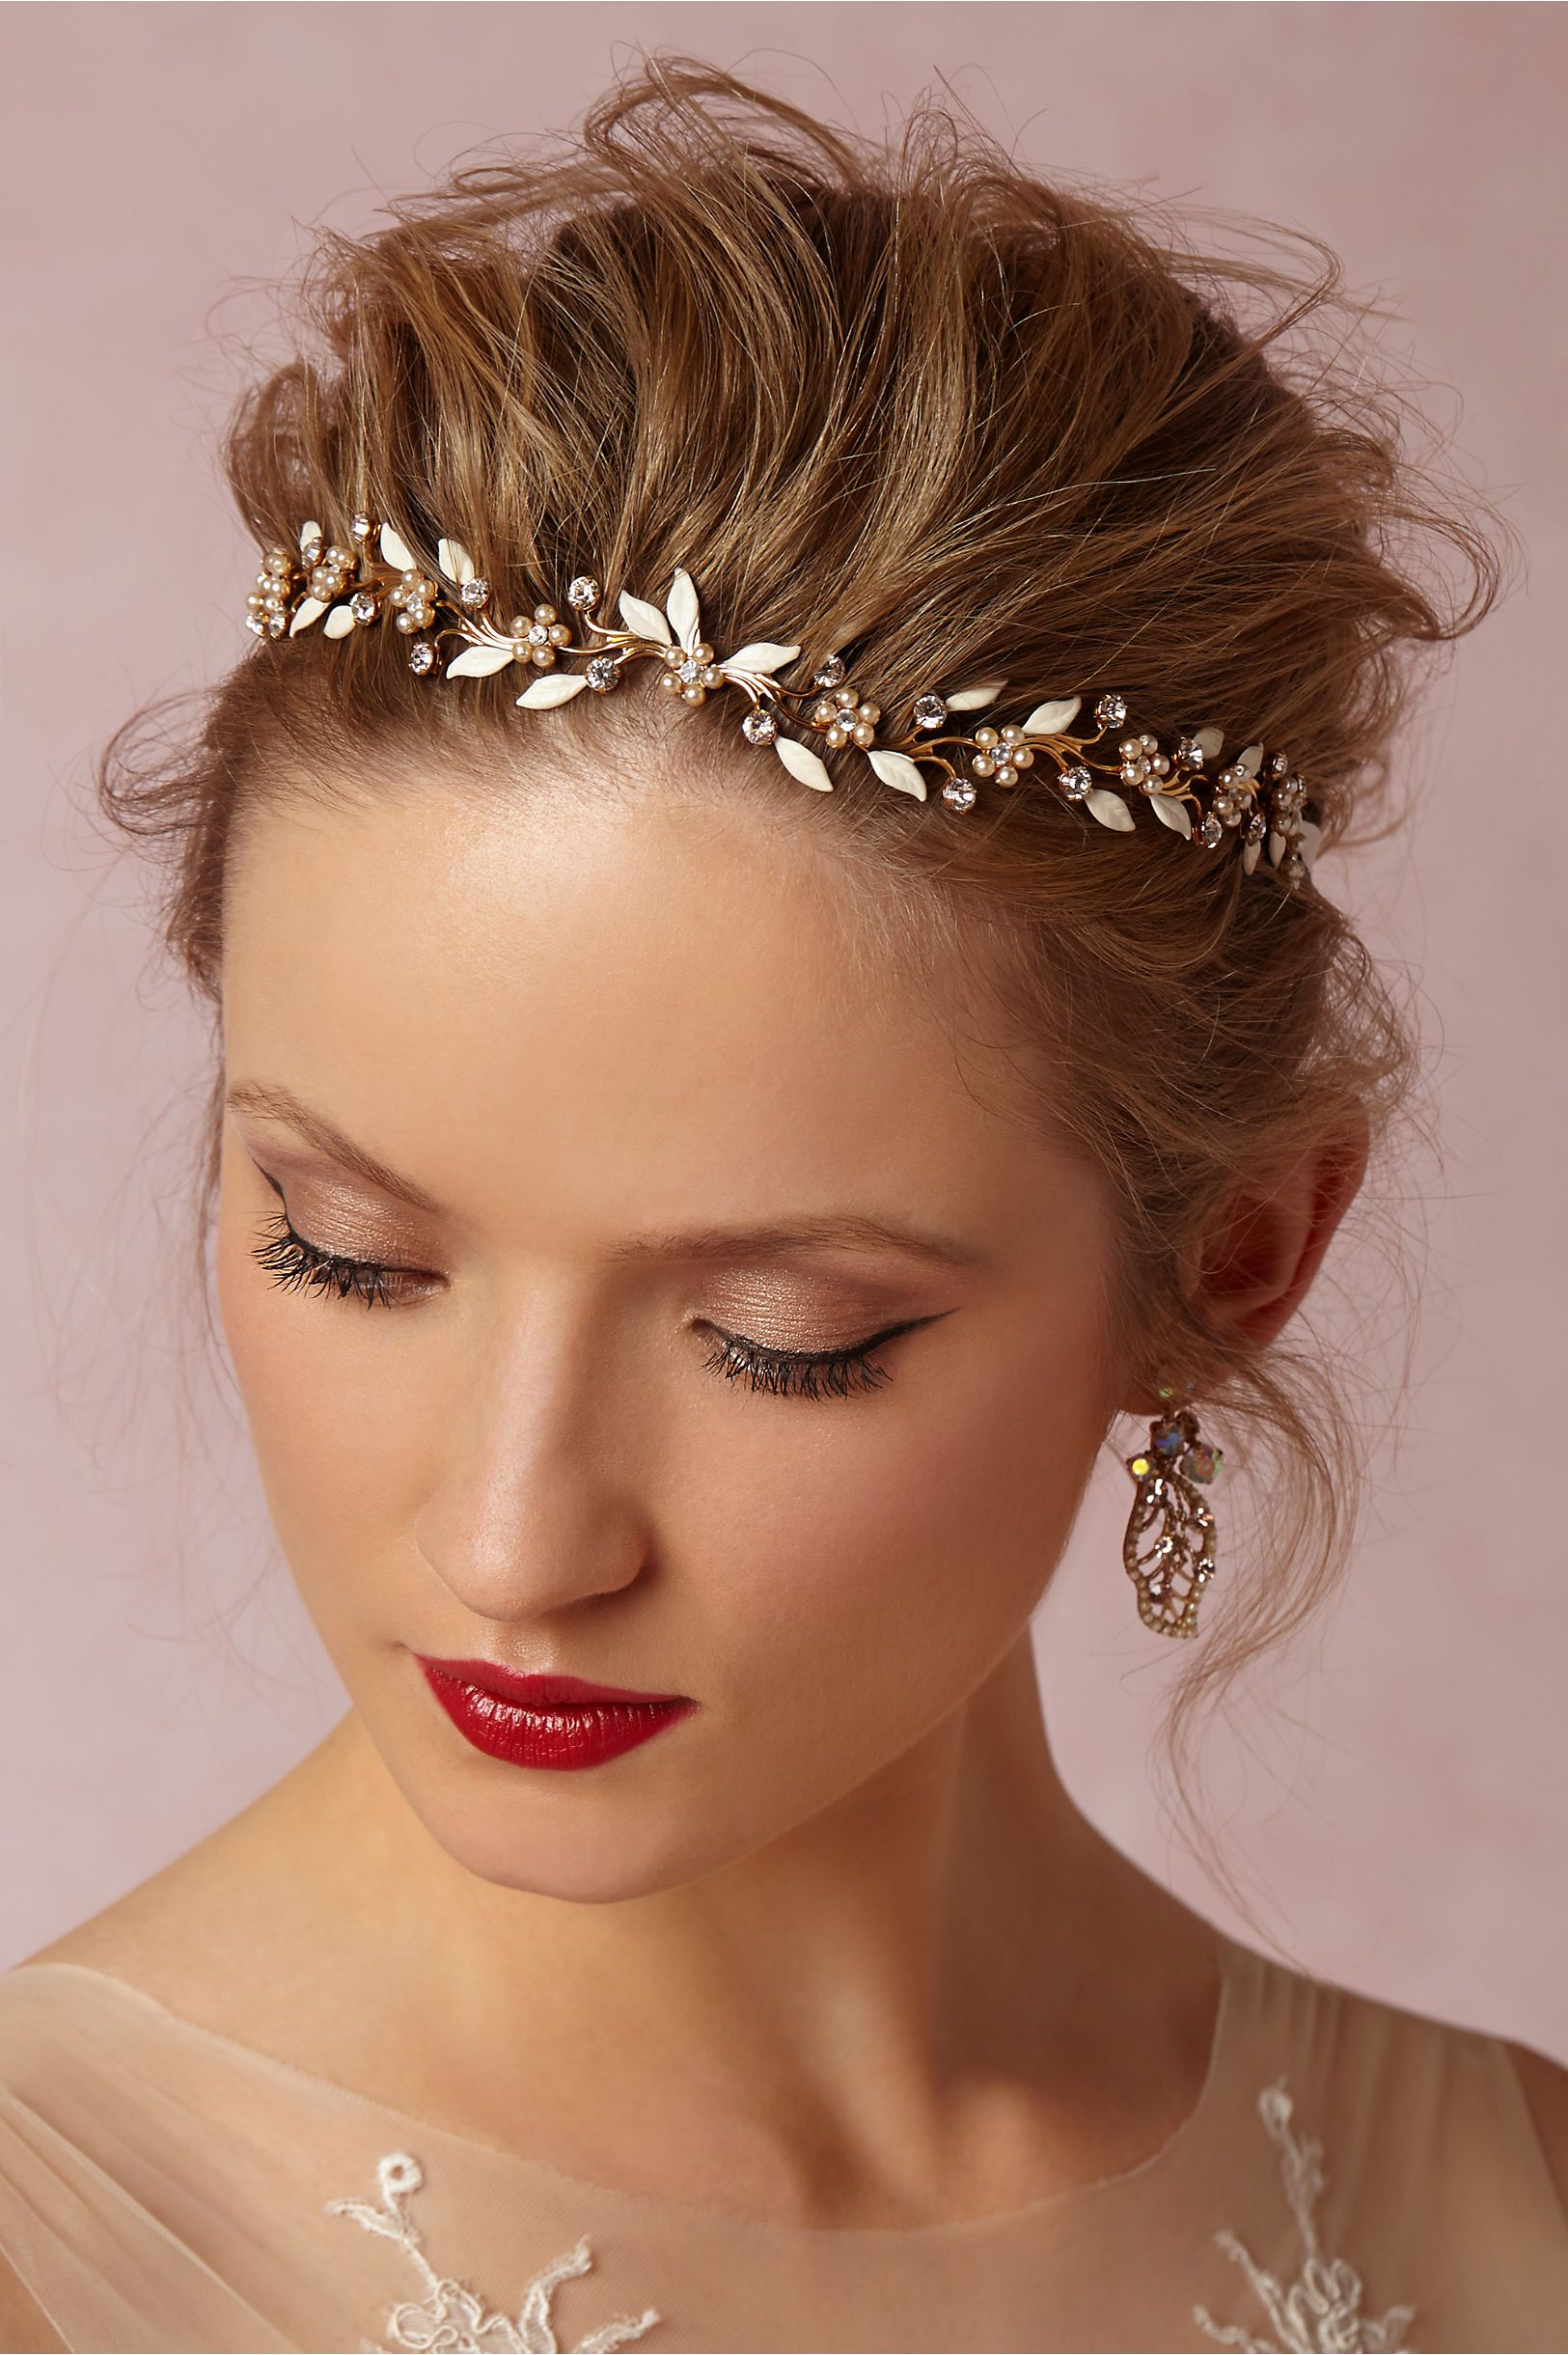 Bluebell halo wedding hair accessories bridal hair